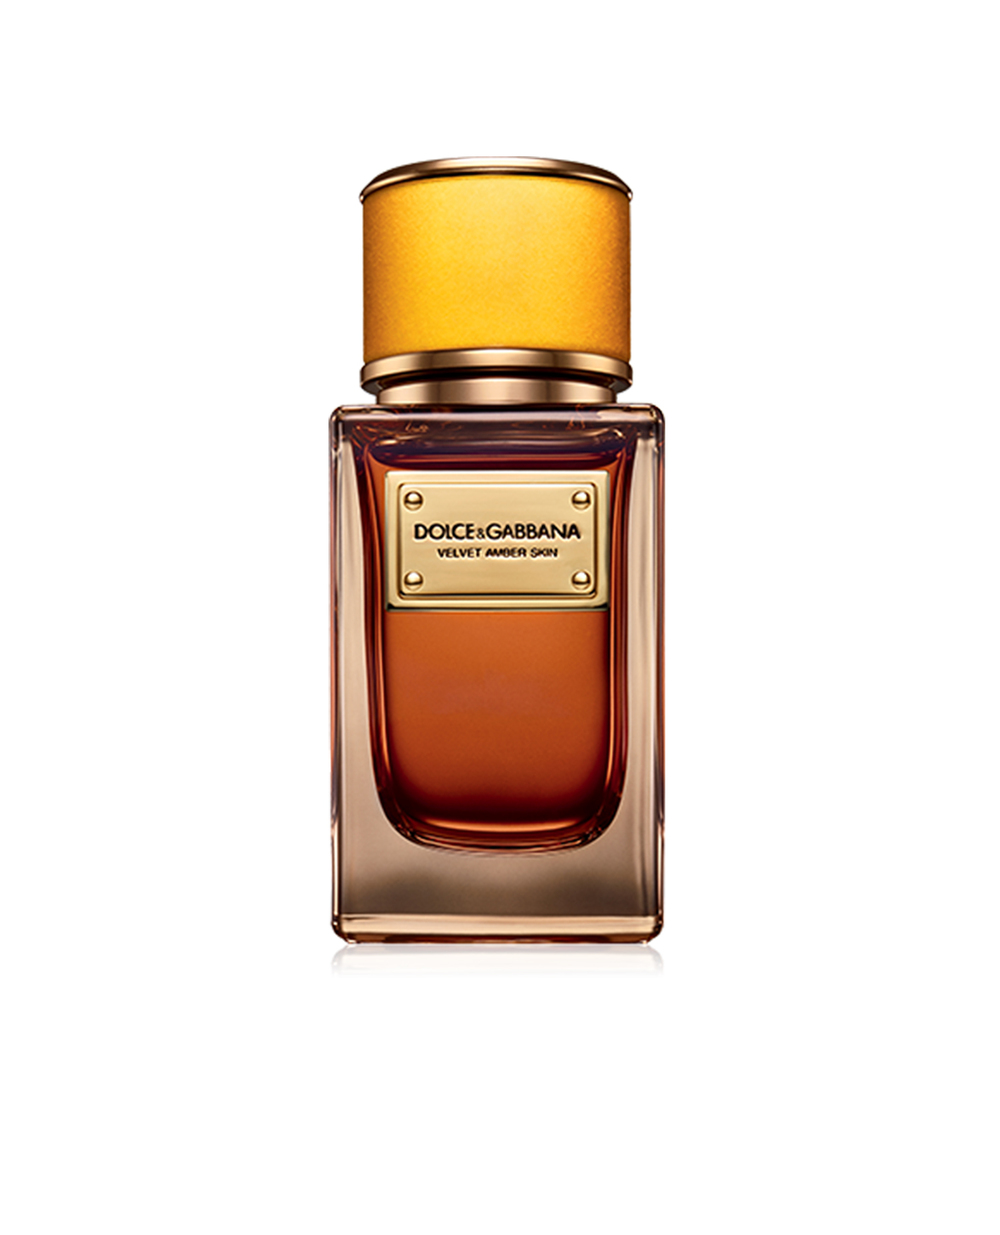 Парфюмированная вода Velvet Amber Skin, 50 мл Dolce&Gabbana 30326550000-ДОЛЬЧЕВЕЛВЕТА — Kameron